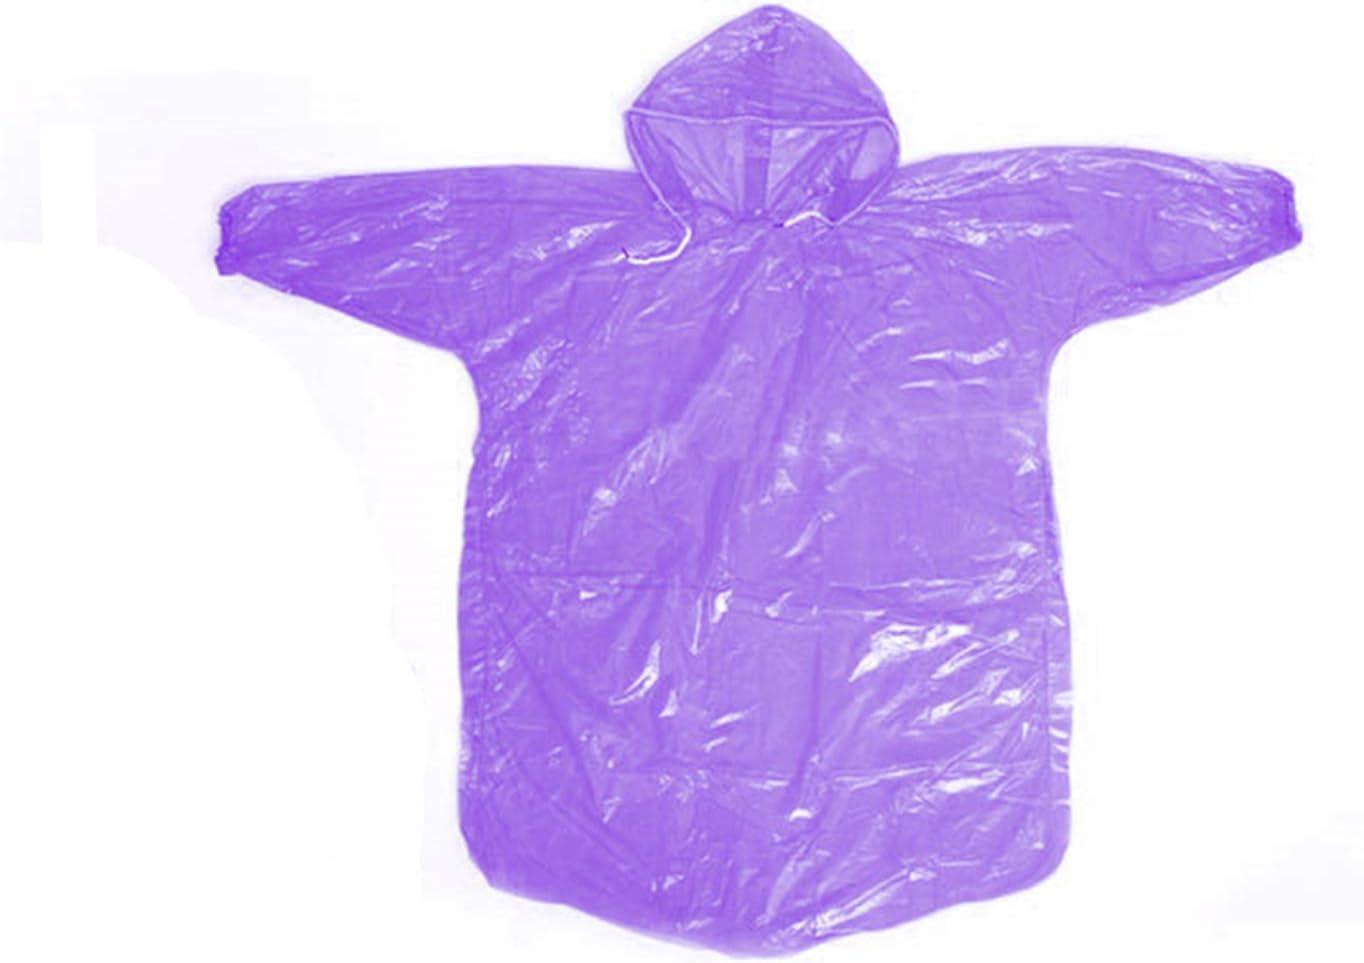 Disposable Rain Ponchos 5 Pack Kids Children Purple Rain Coat with Drawstring Hood & Sleeve